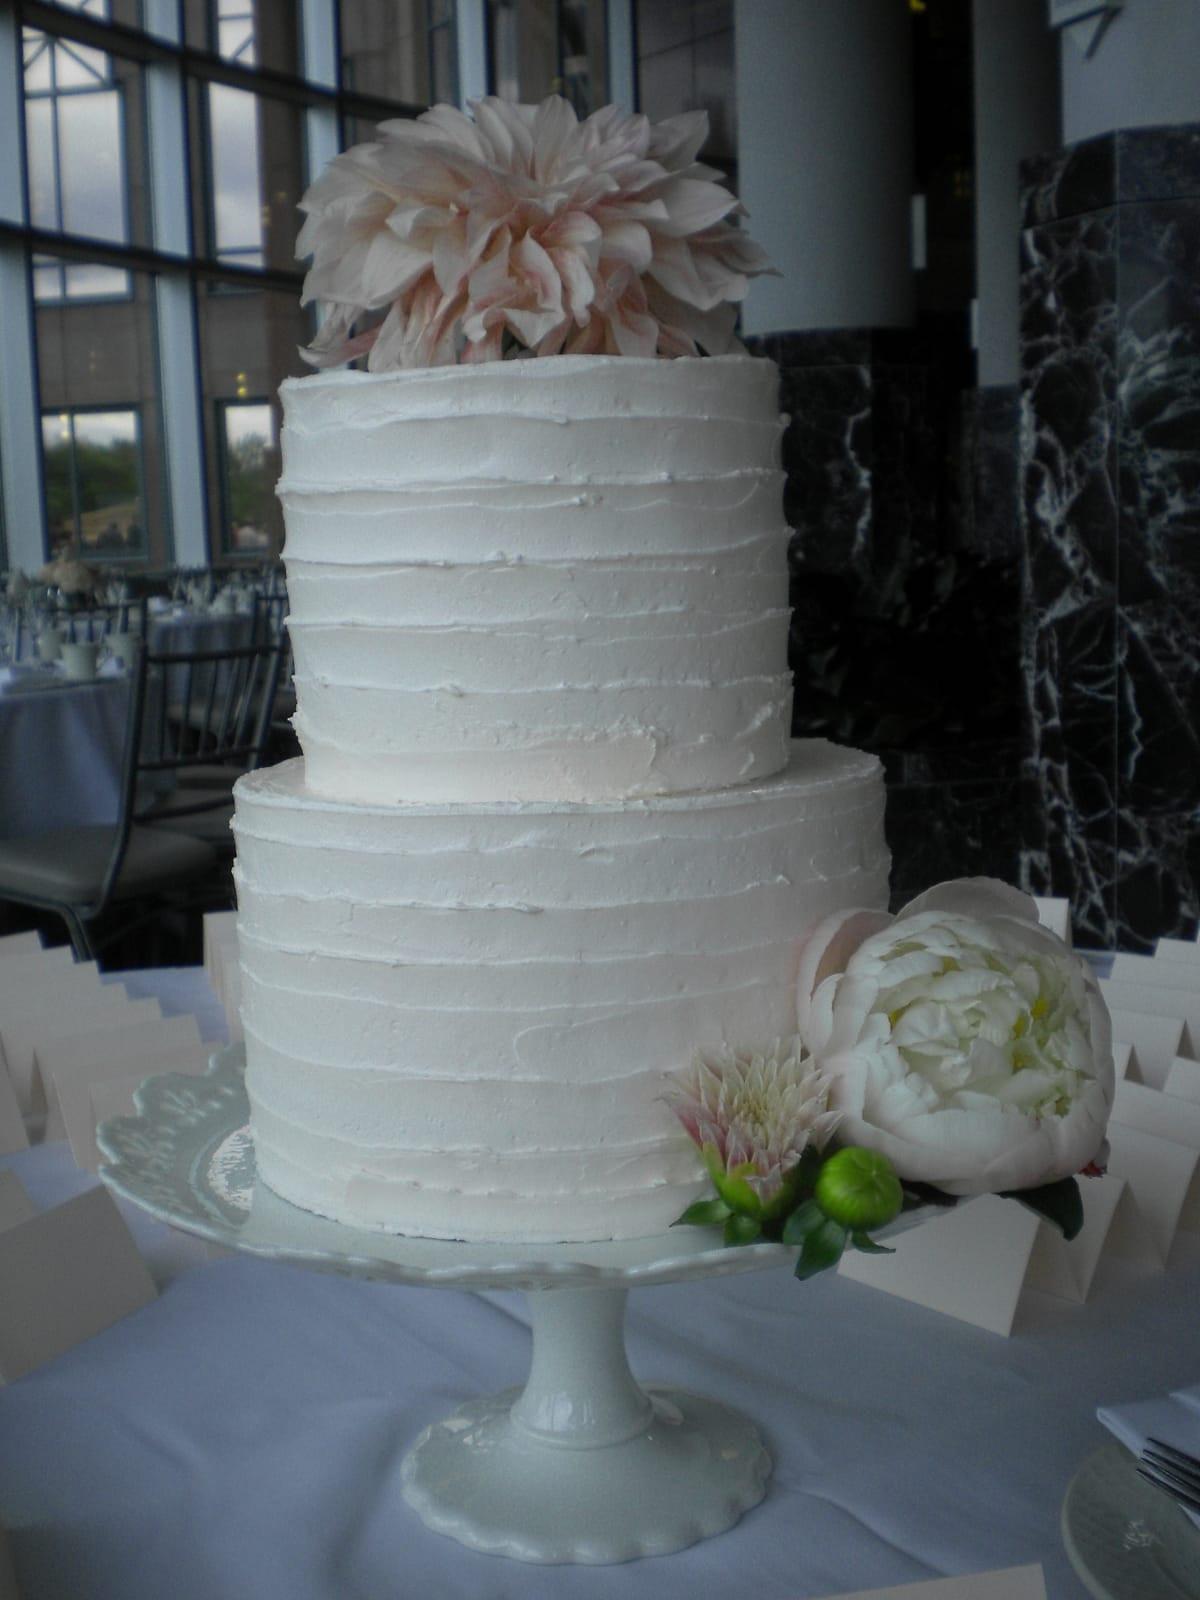 Wedding Cakes Mpls  Gluten Free Desserts MN gluten free cakes Minneapolis